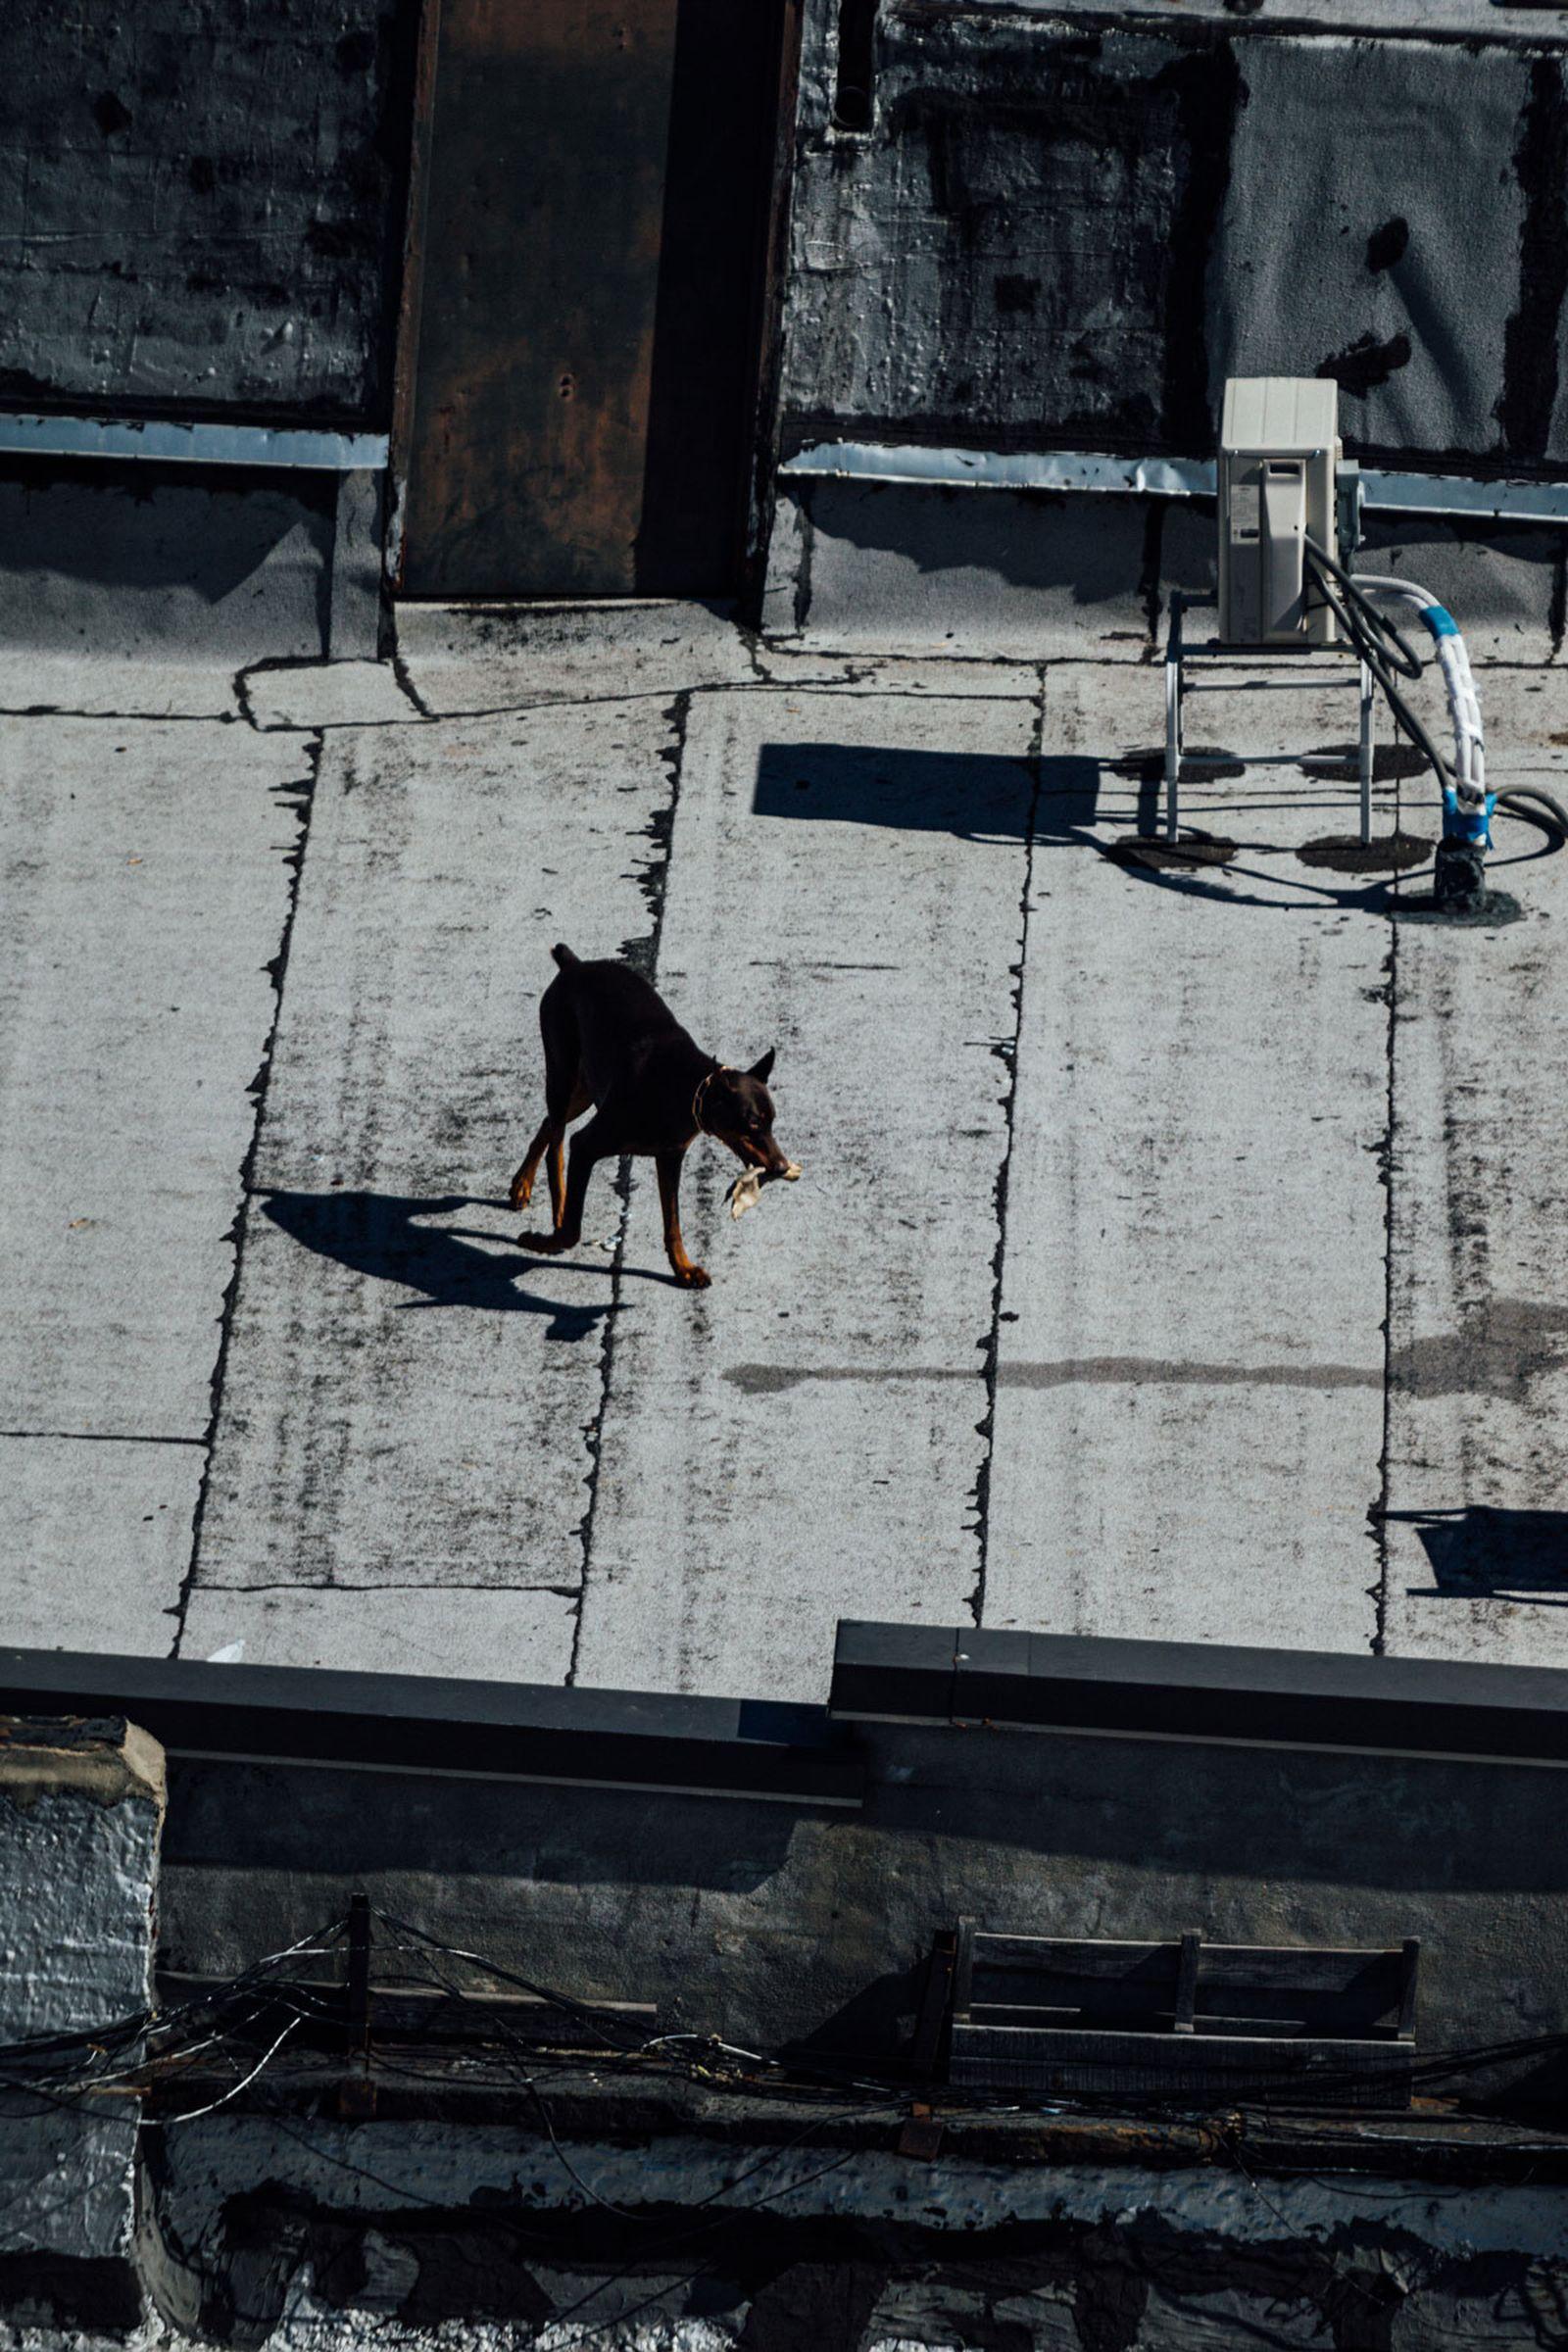 citizens-new-york-city-quarantine-seen-06